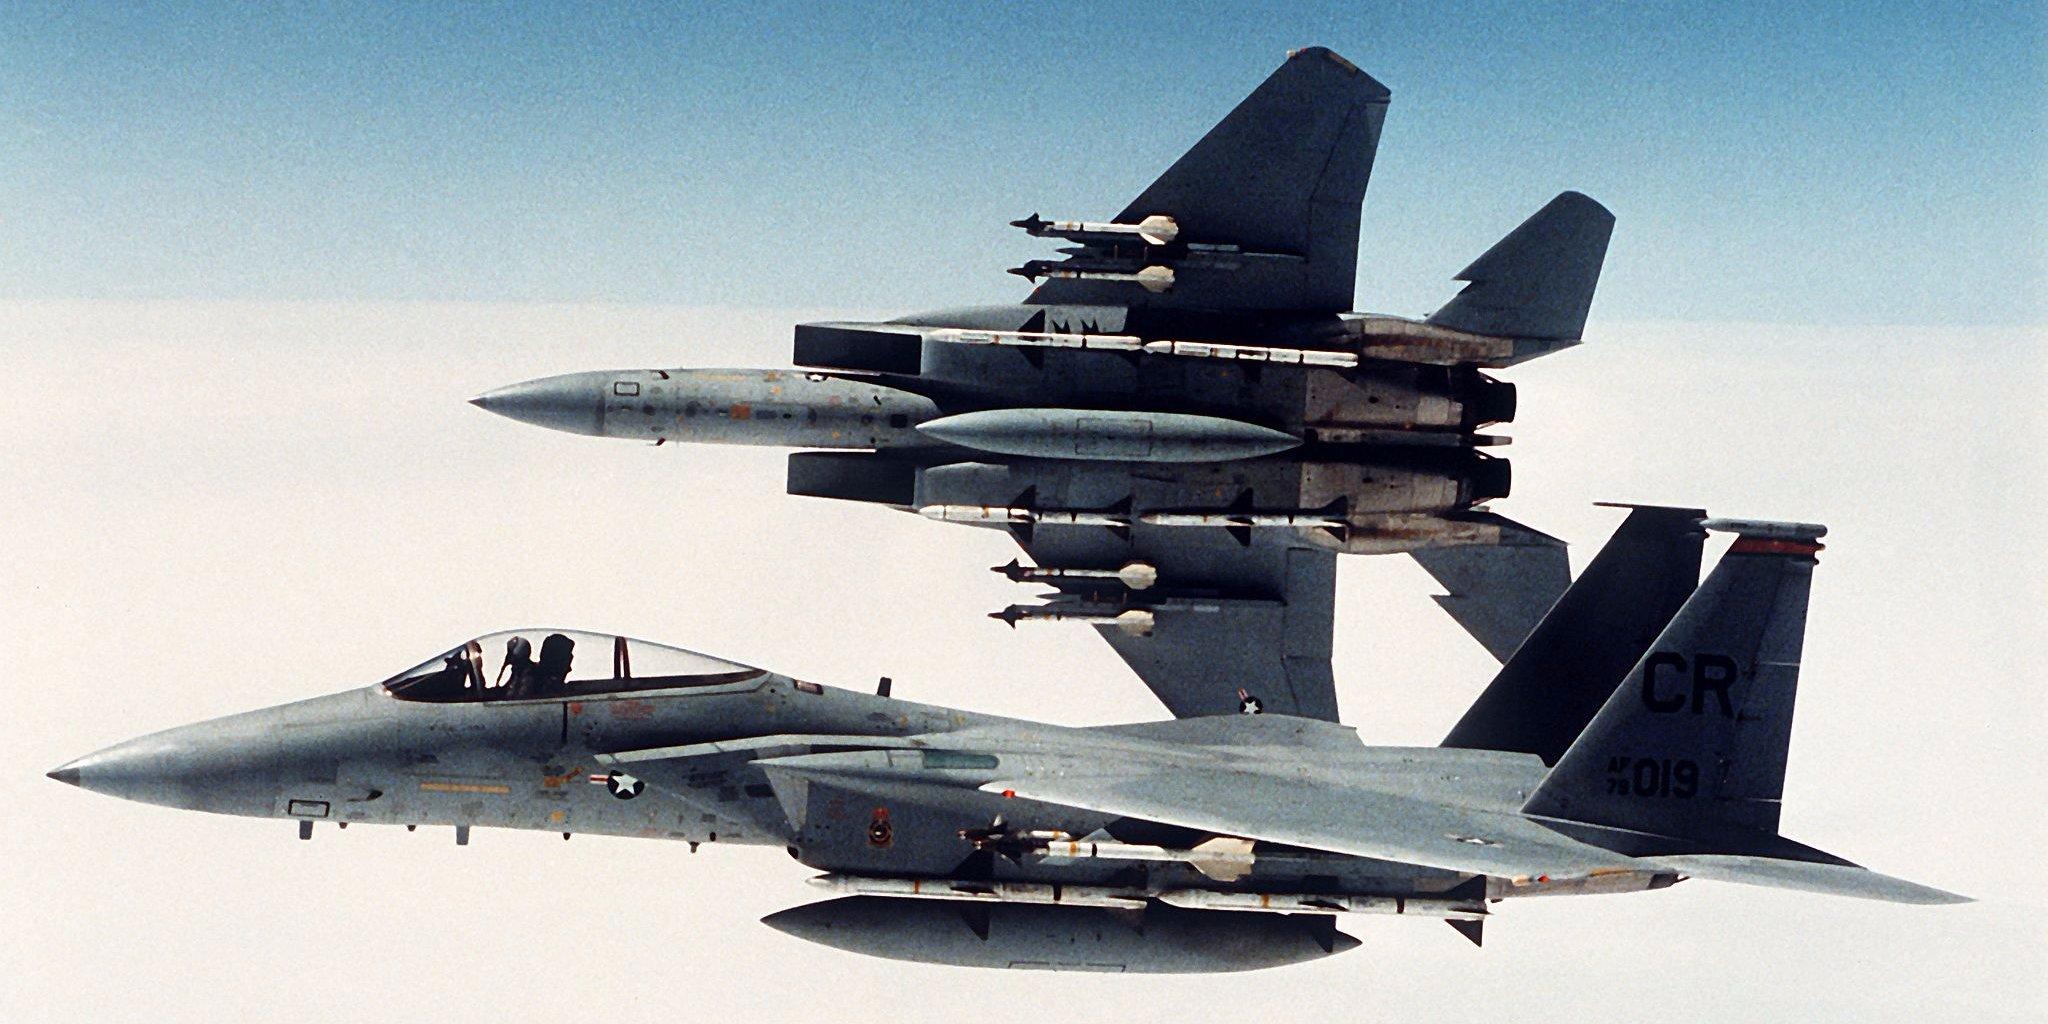 F15-Eagles